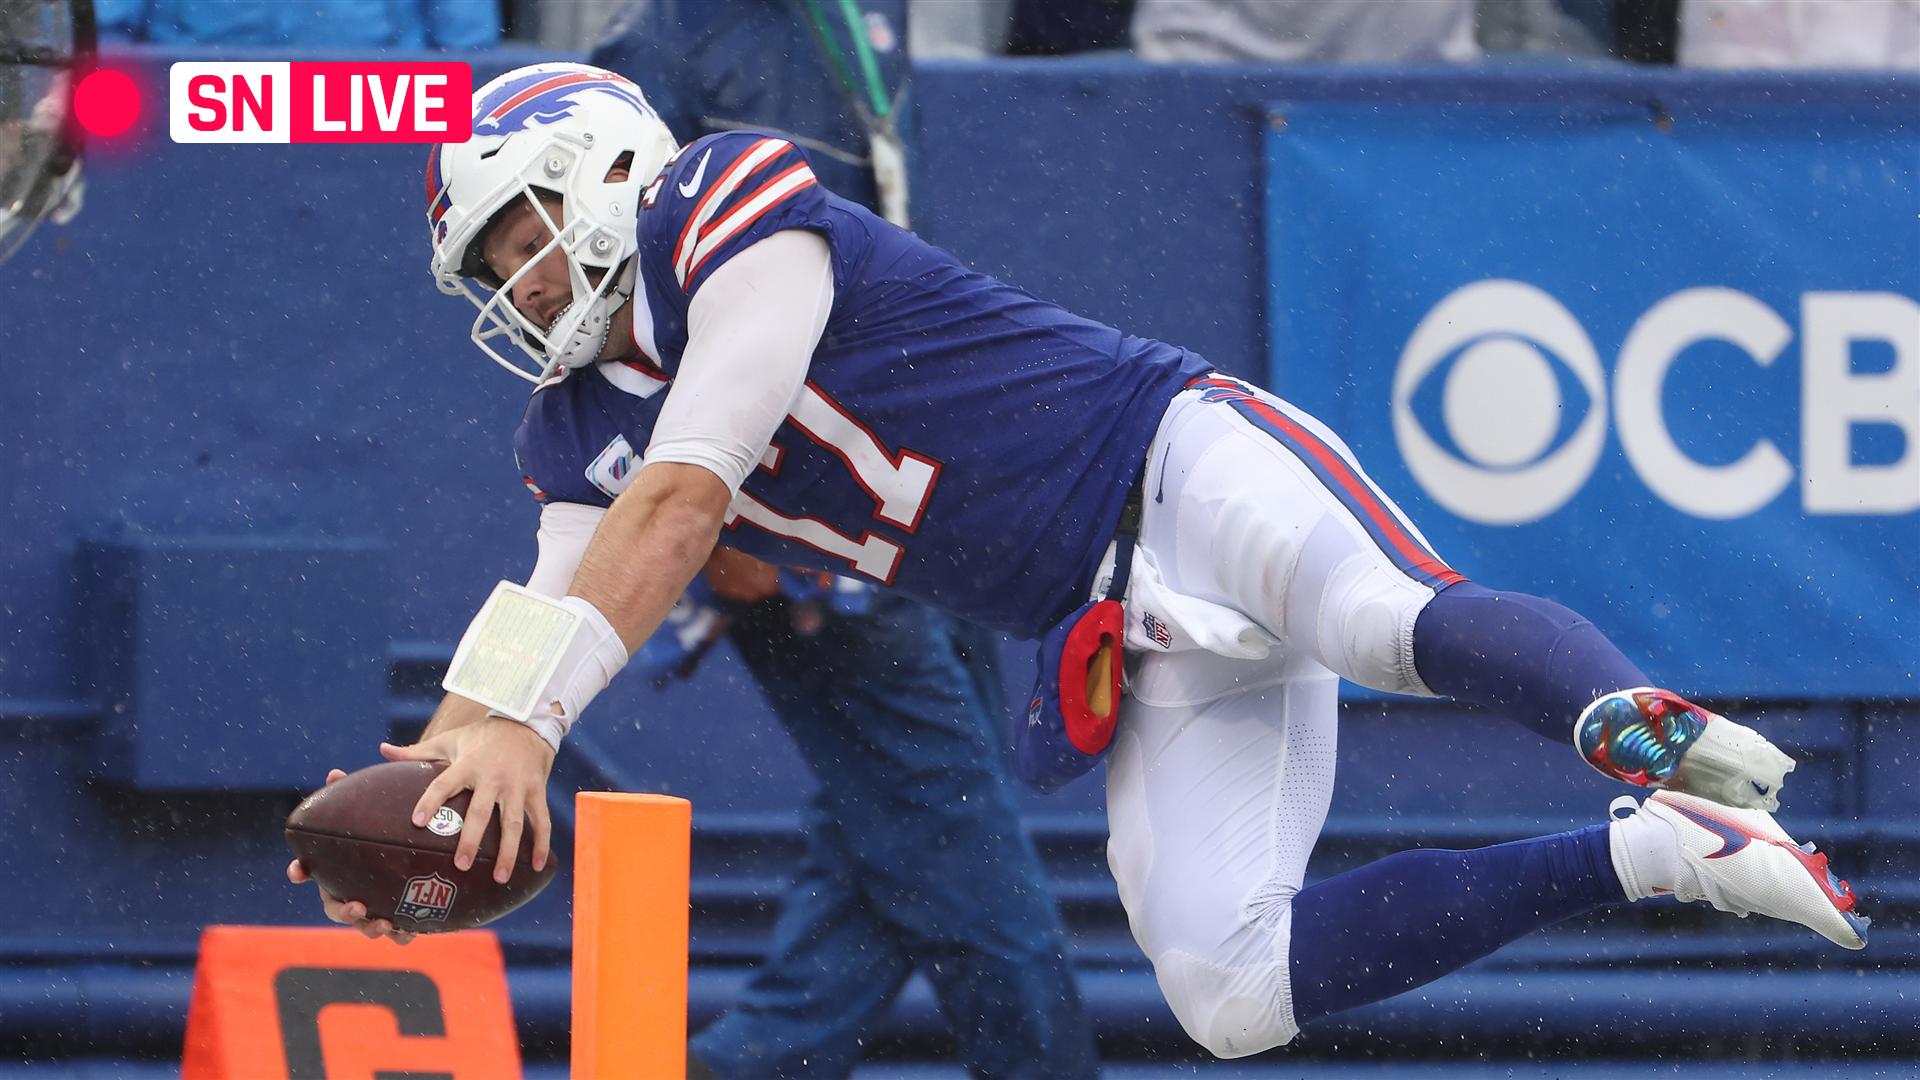 Bills vs. Chiefs reside rating, updates, highlights from NFL 'Sunday Night Football' recreation thumbnail